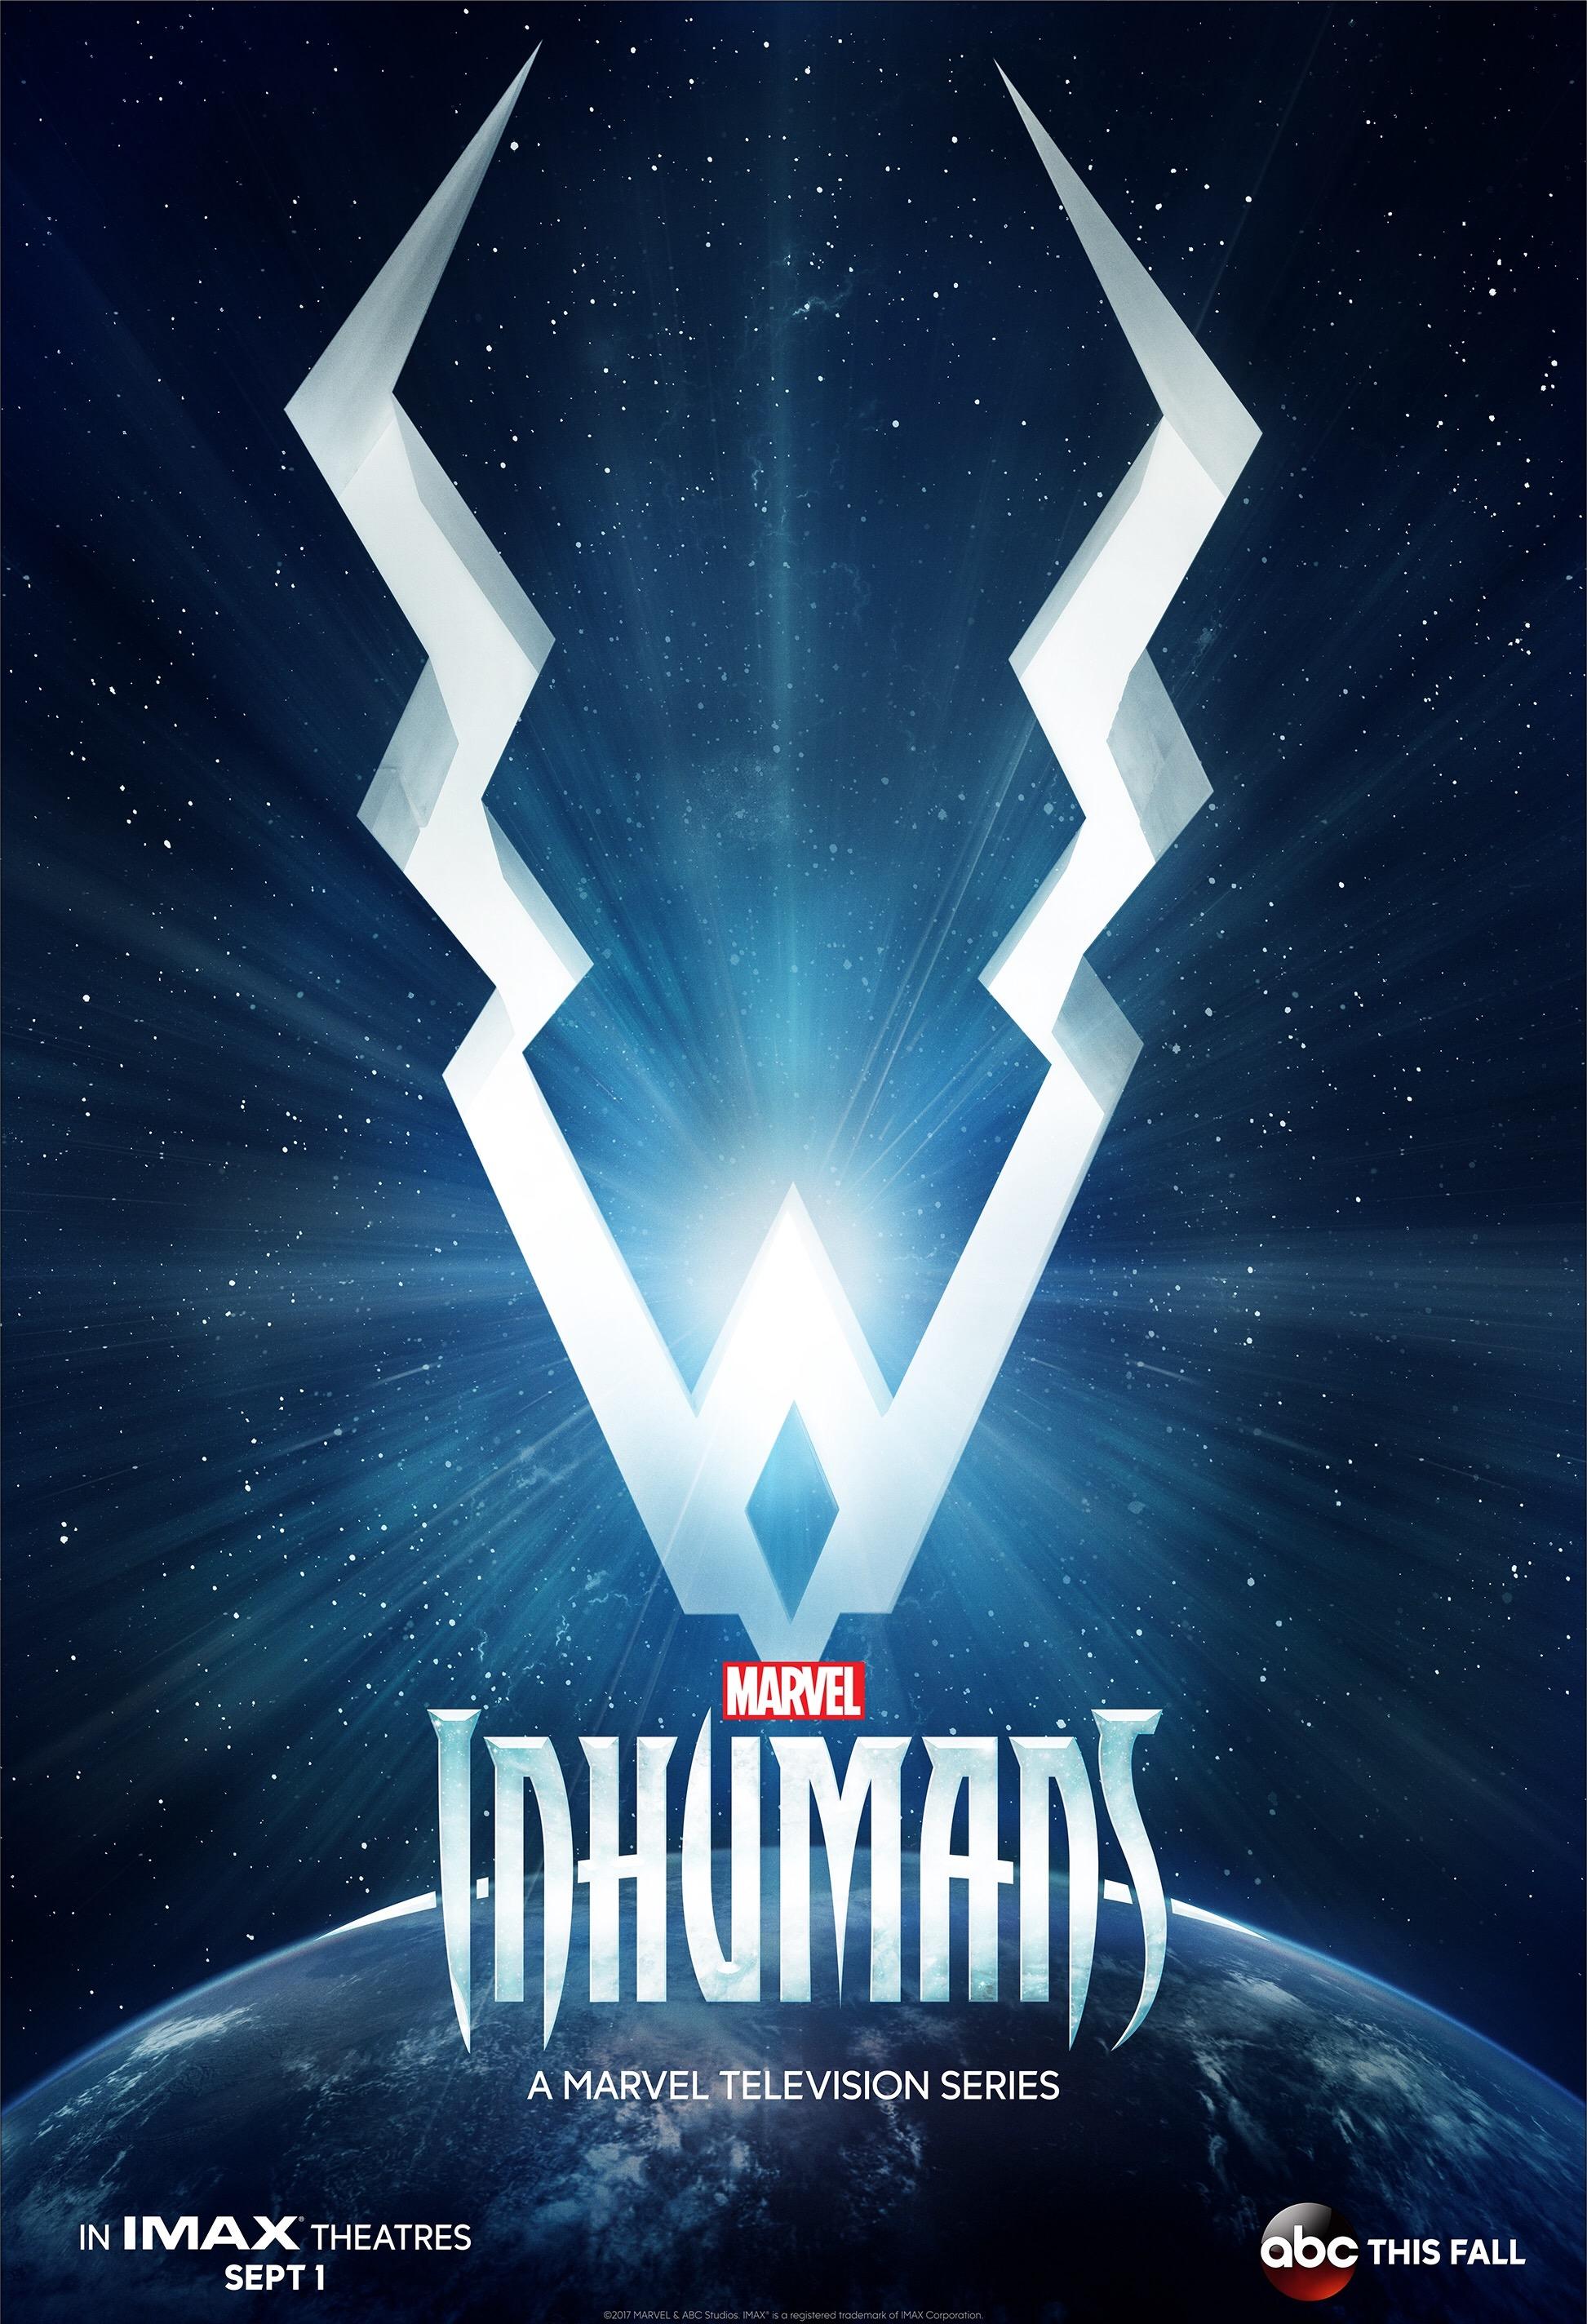 Marvel's Inhumans Teaser Trailer Released